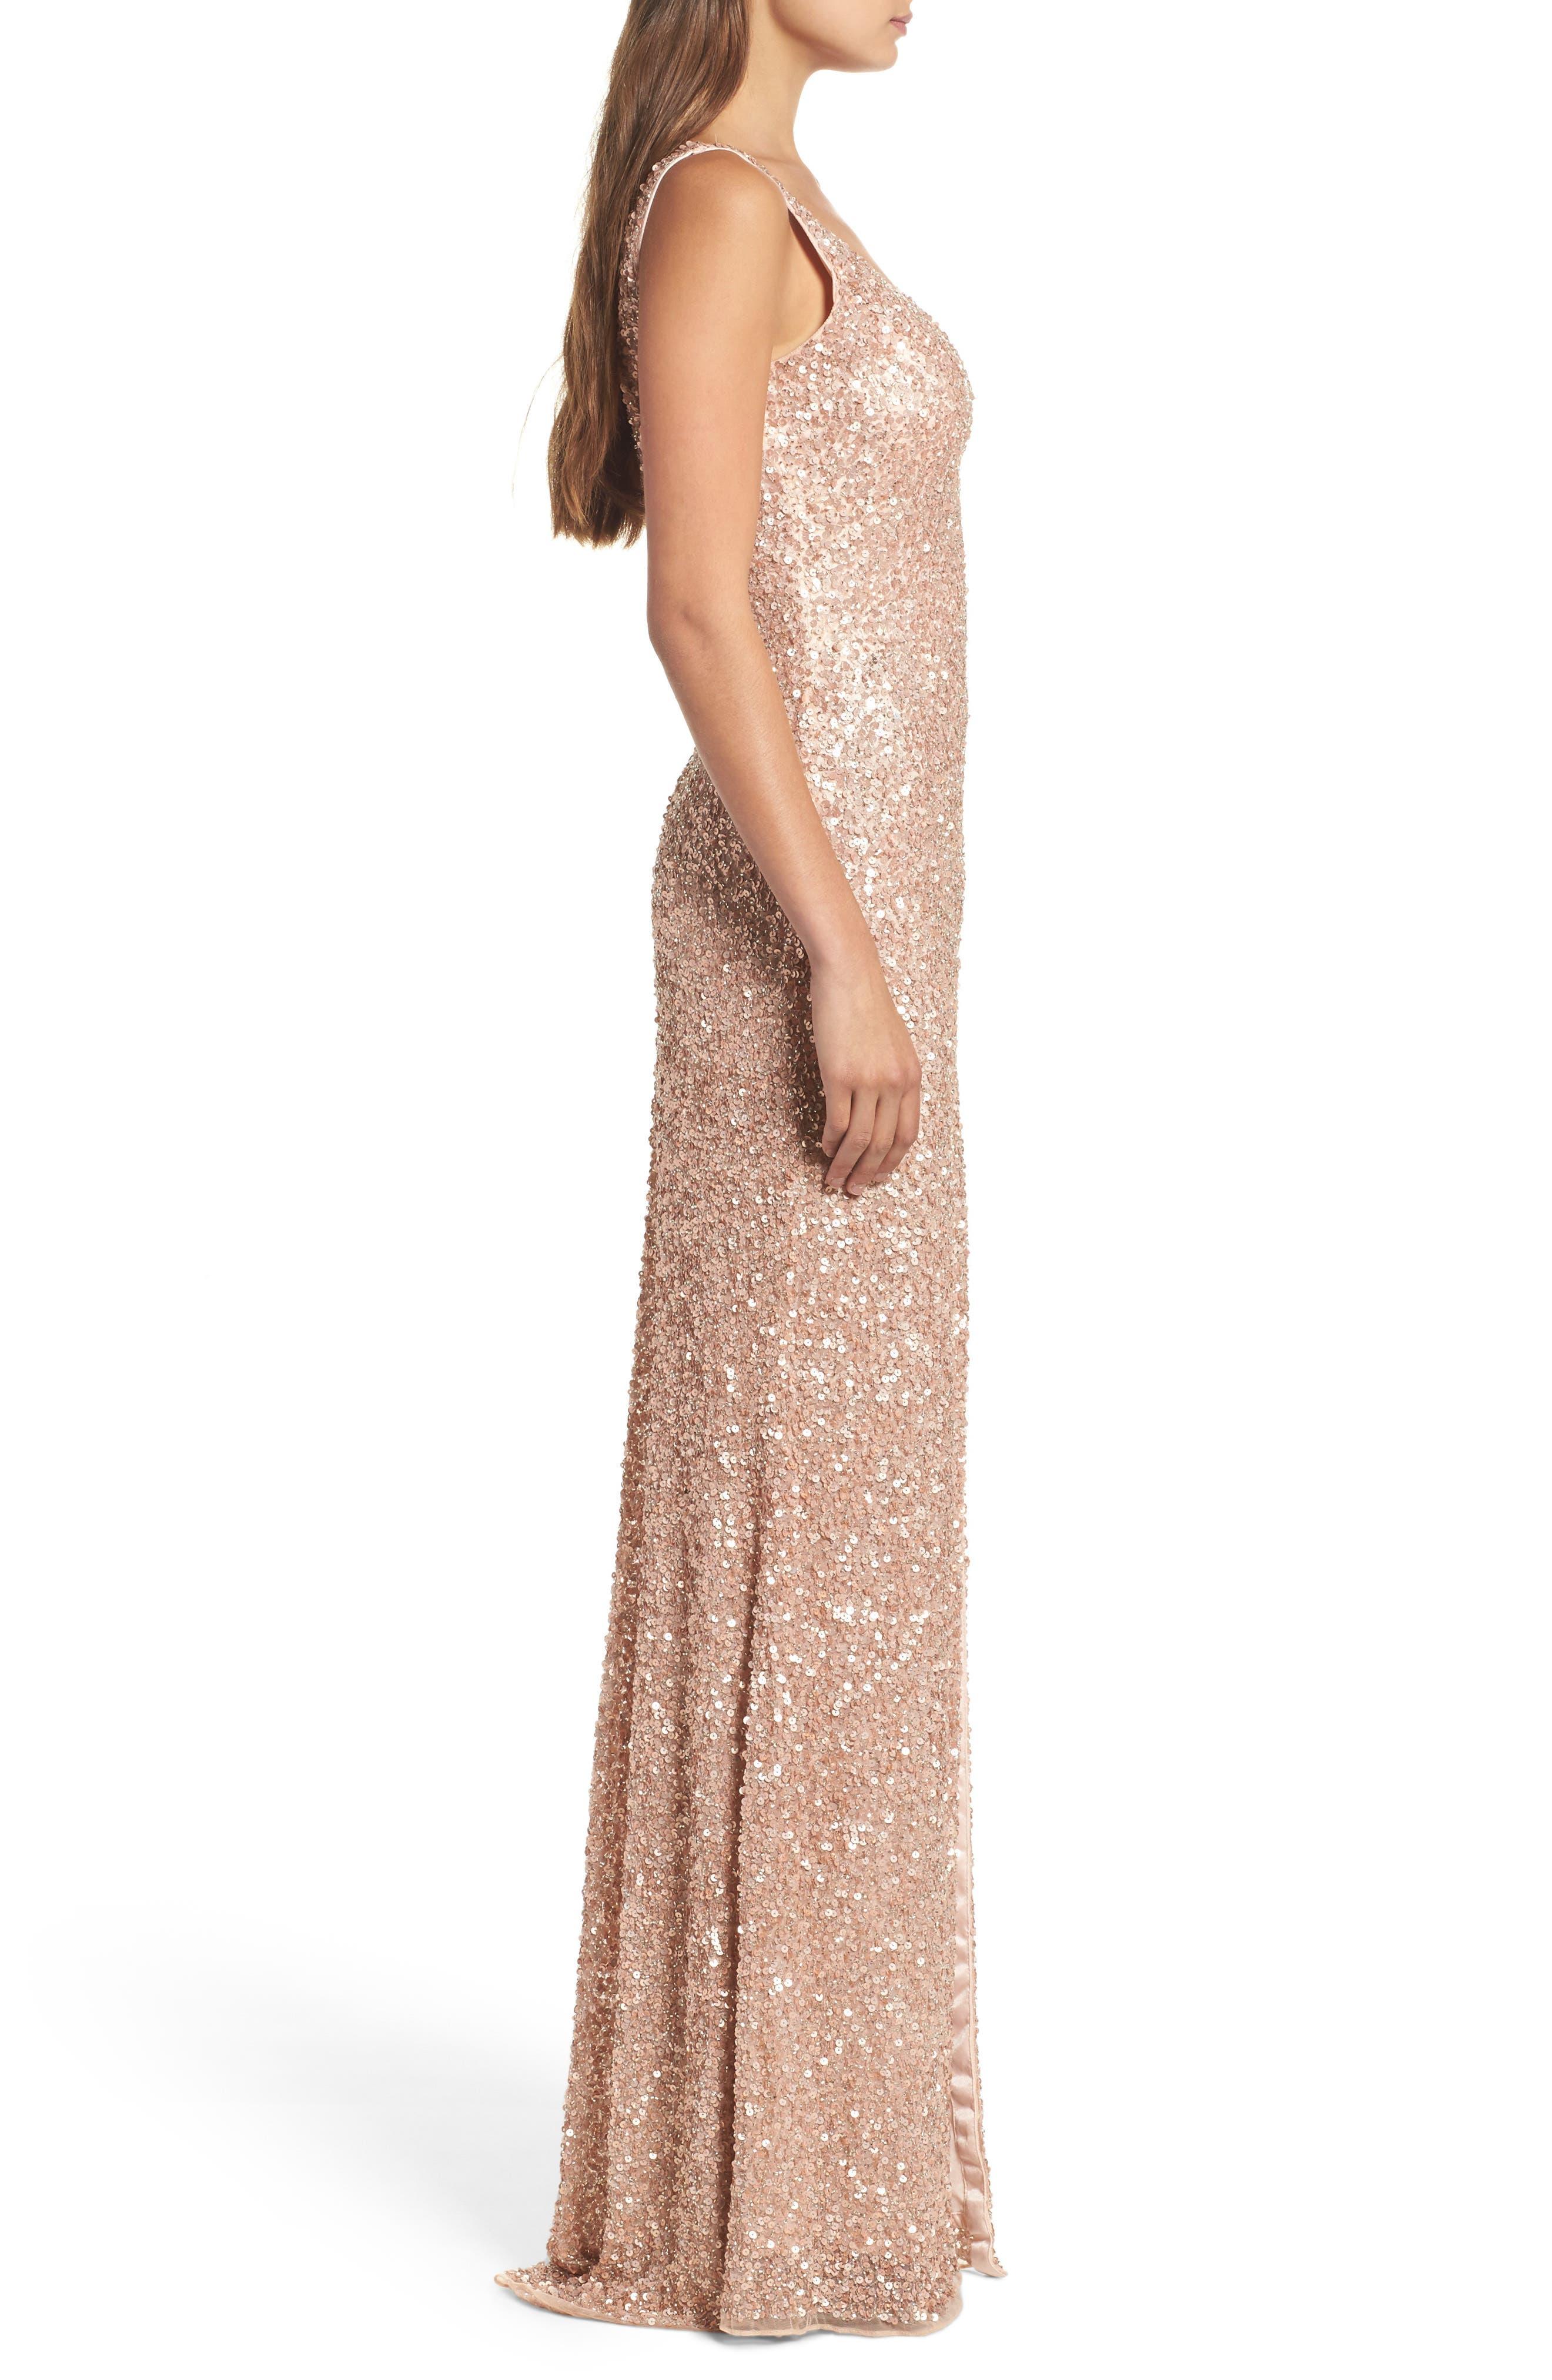 MAC DUGGAL, Sequin Slit Gown, Alternate thumbnail 3, color, ROSE GOLD